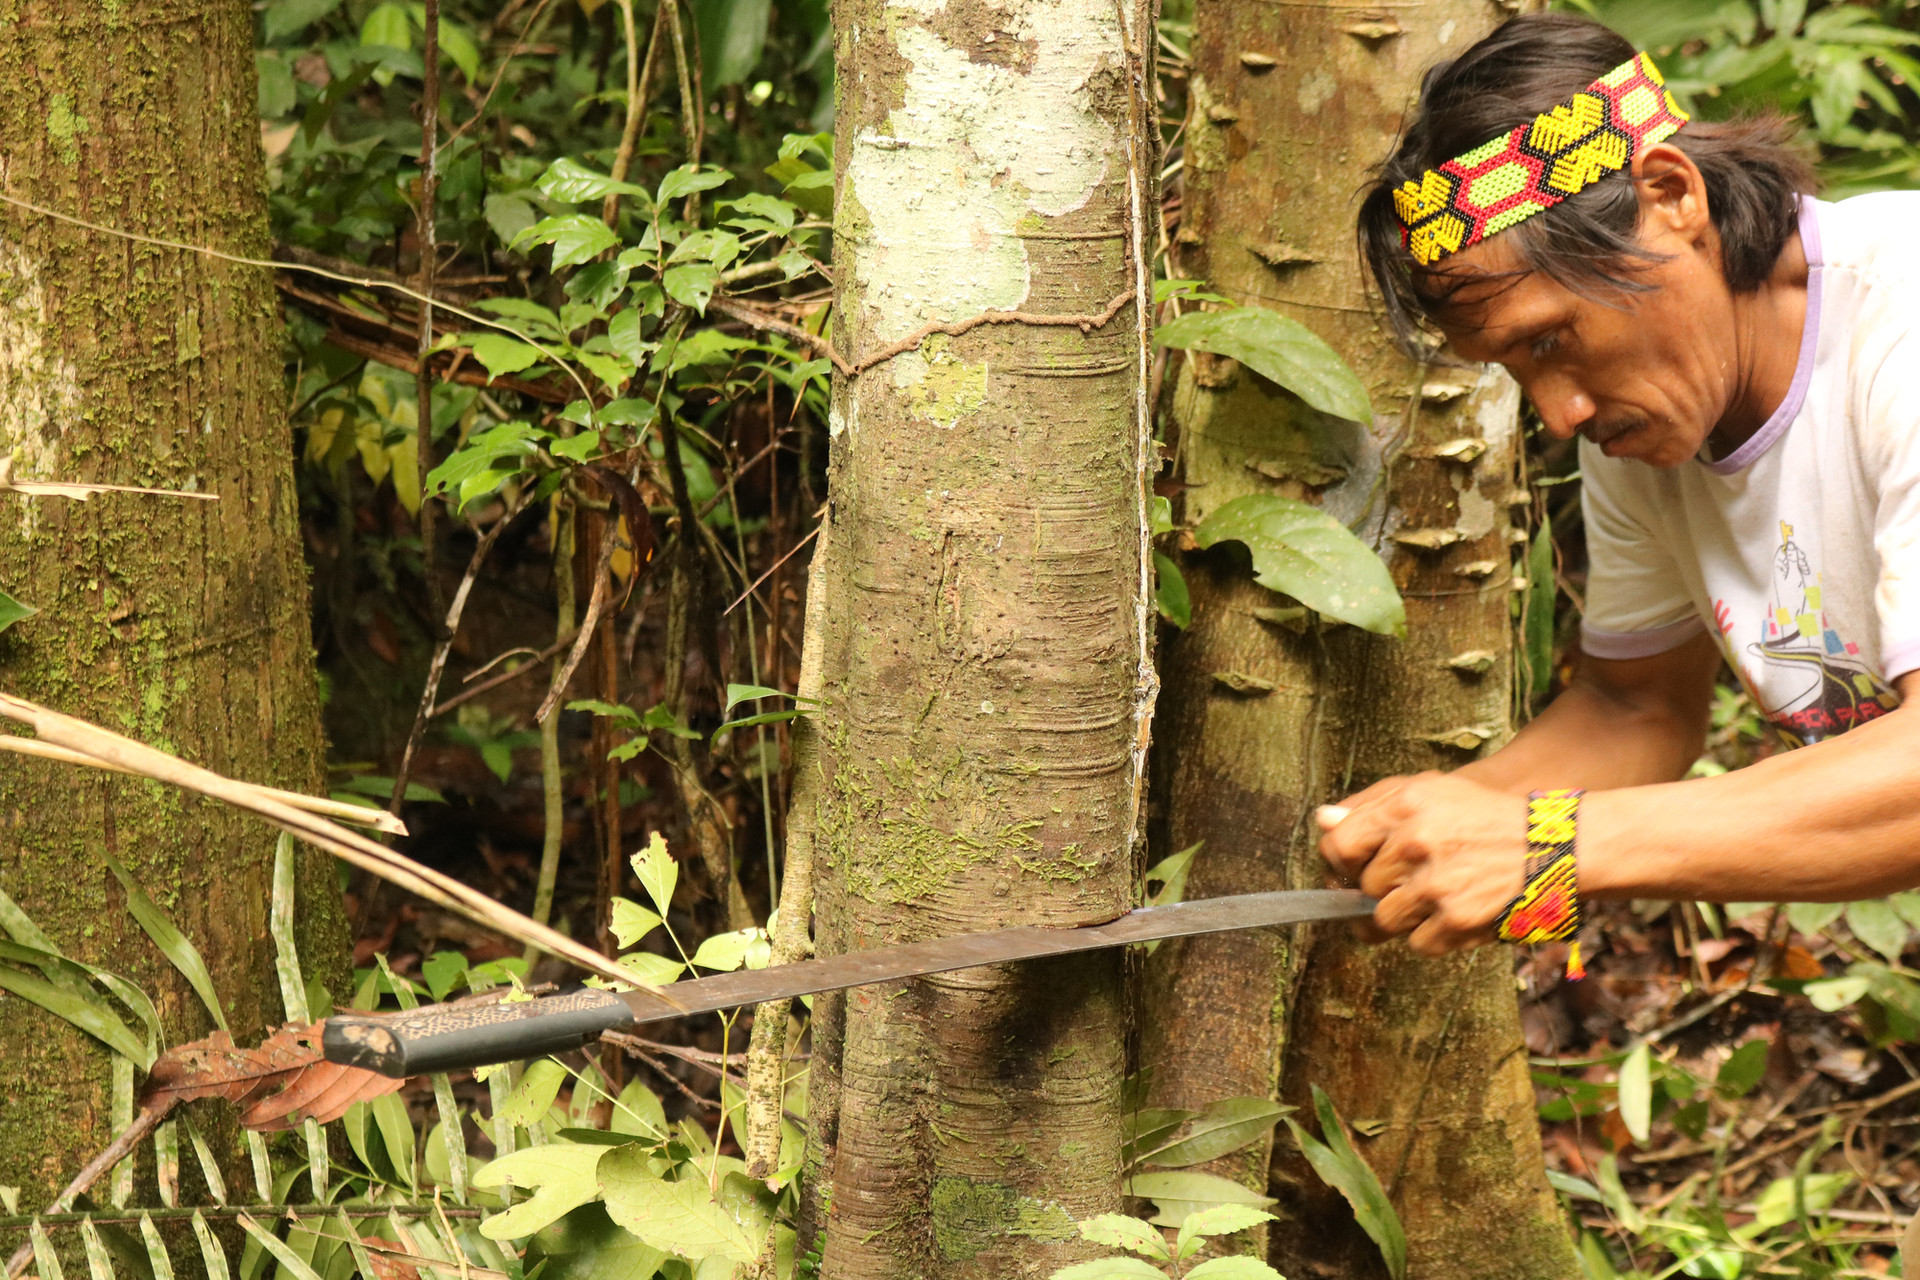 In the Amazon Rainforest